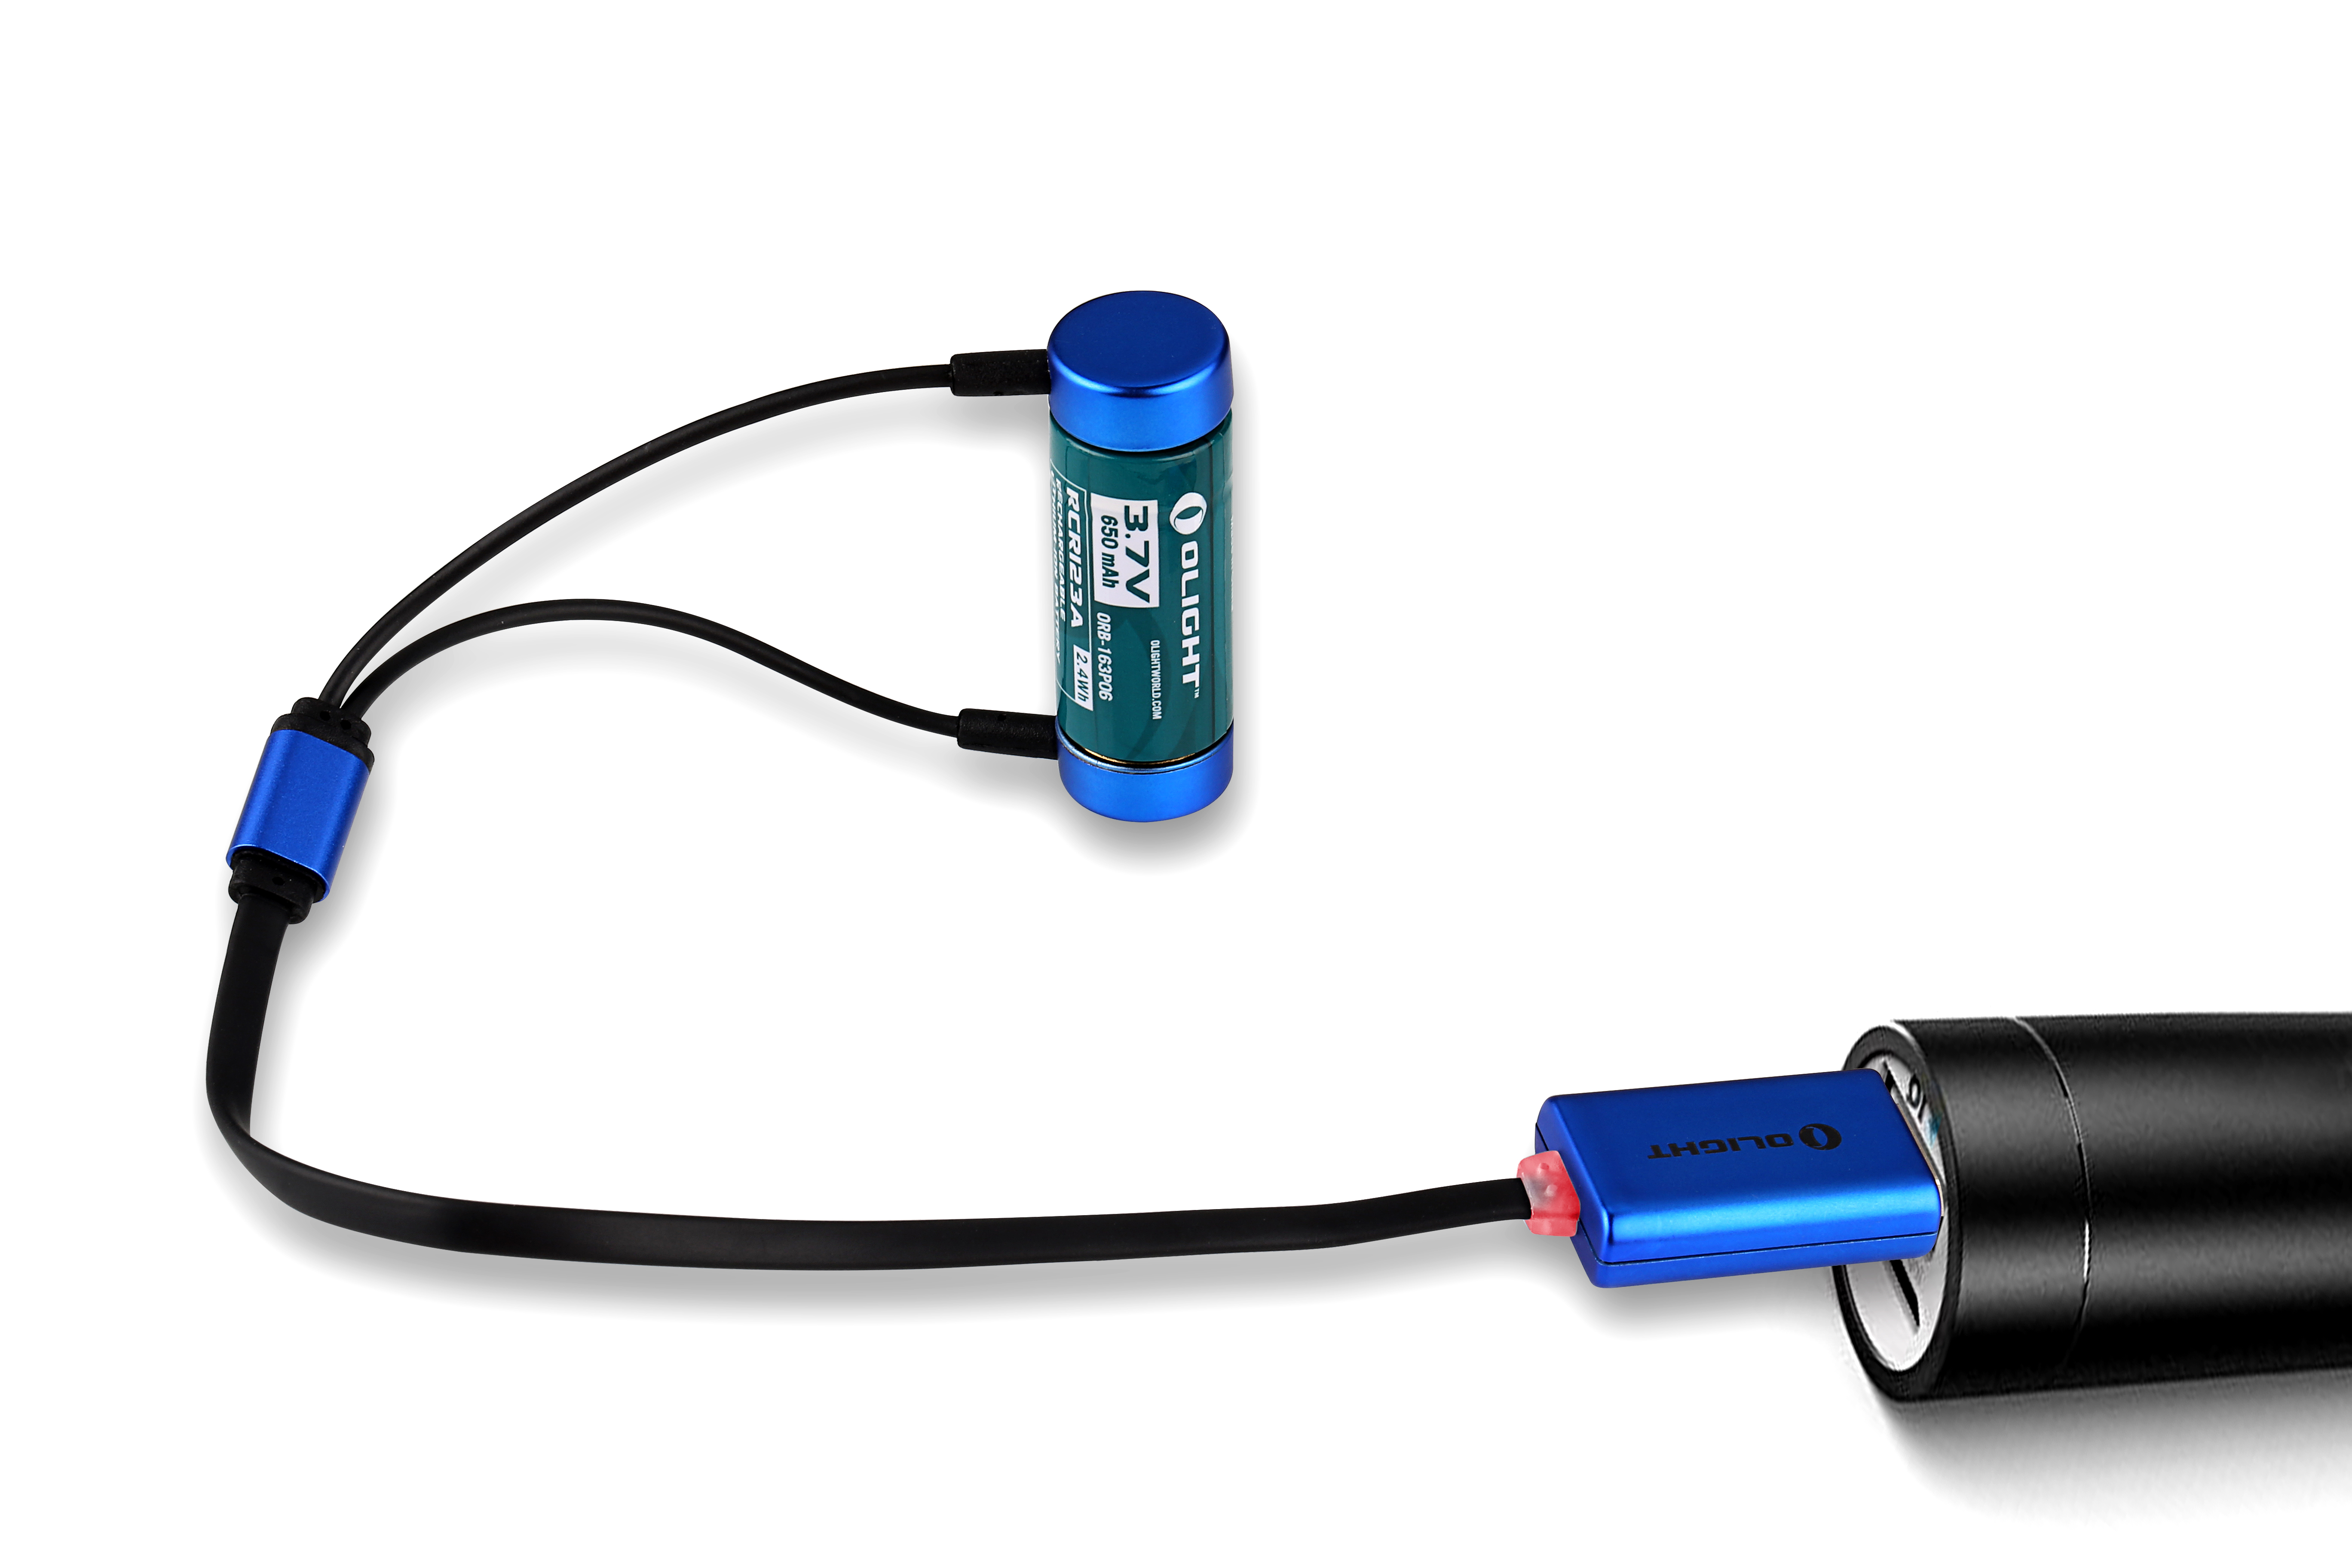 OLIGHT Magnetisches MCC3 USB Ladekabel